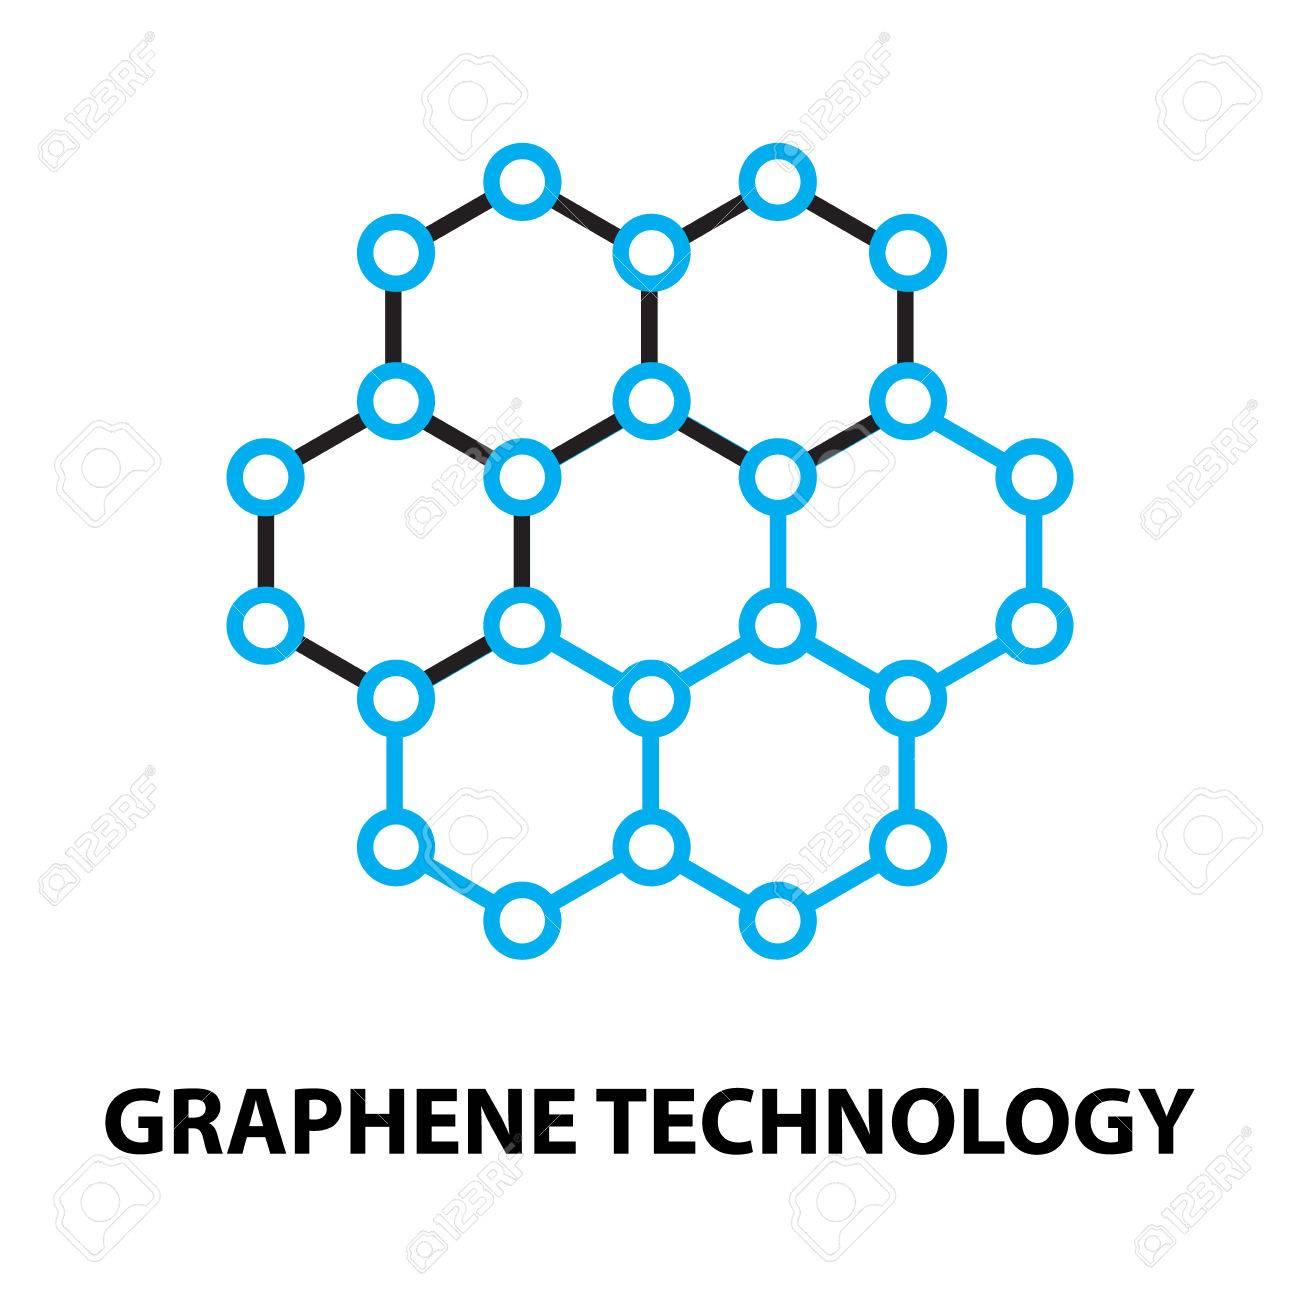 Graphene nano technology Icon, and symbol